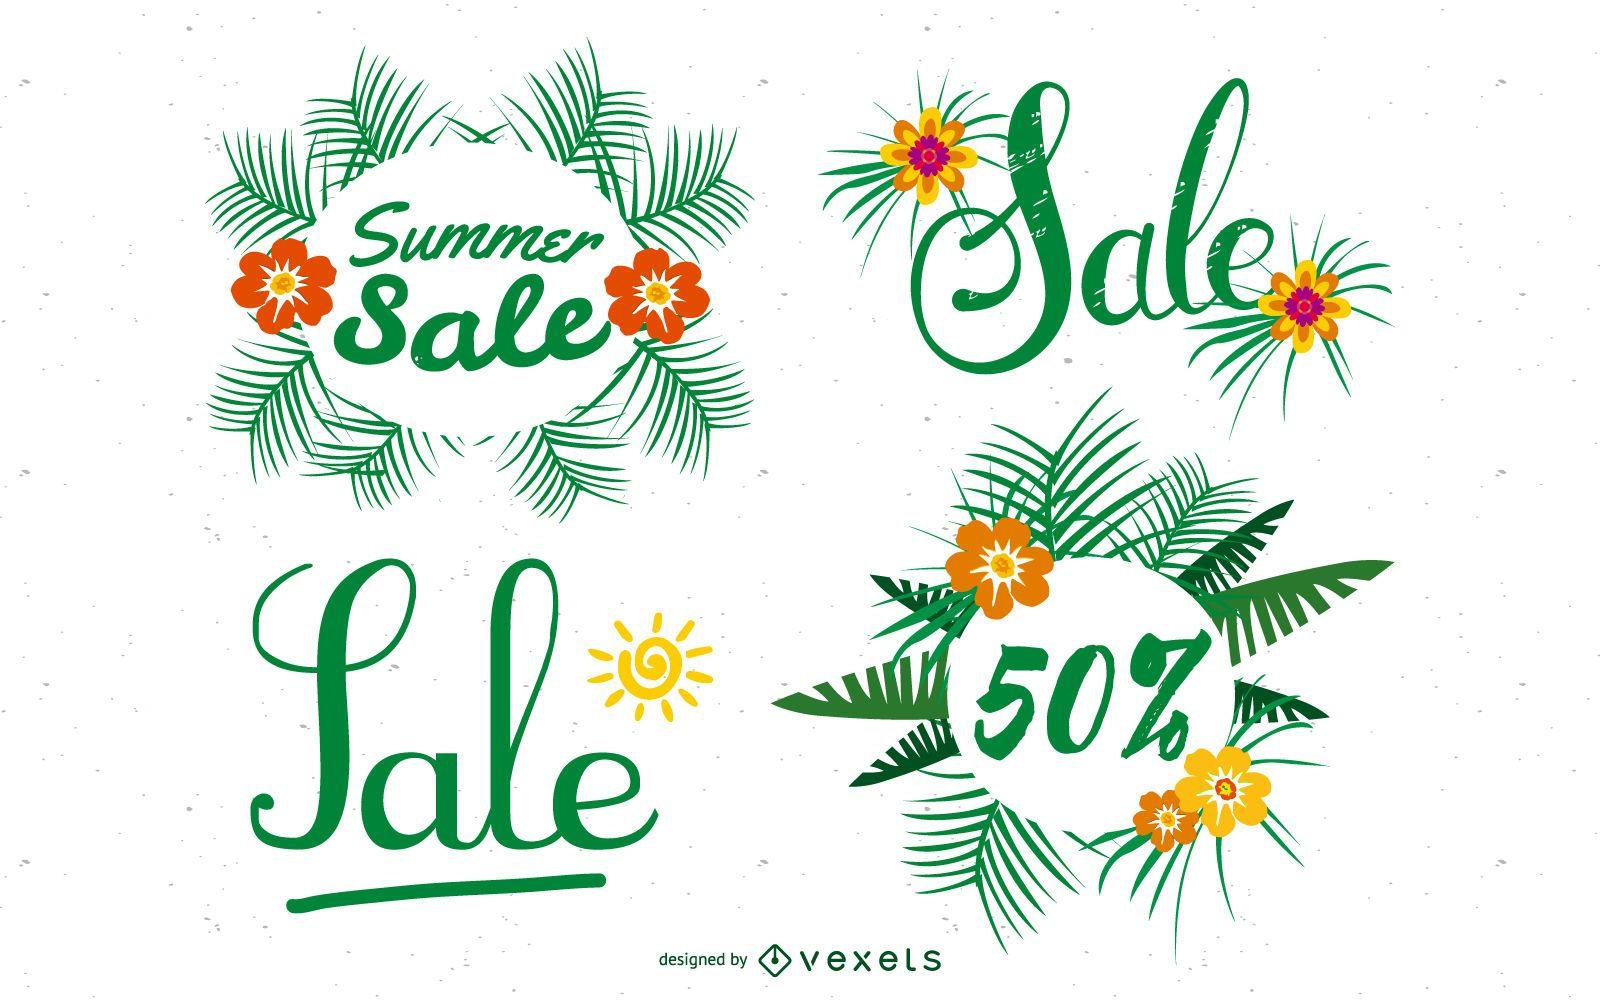 Summer Deals Posters Vector